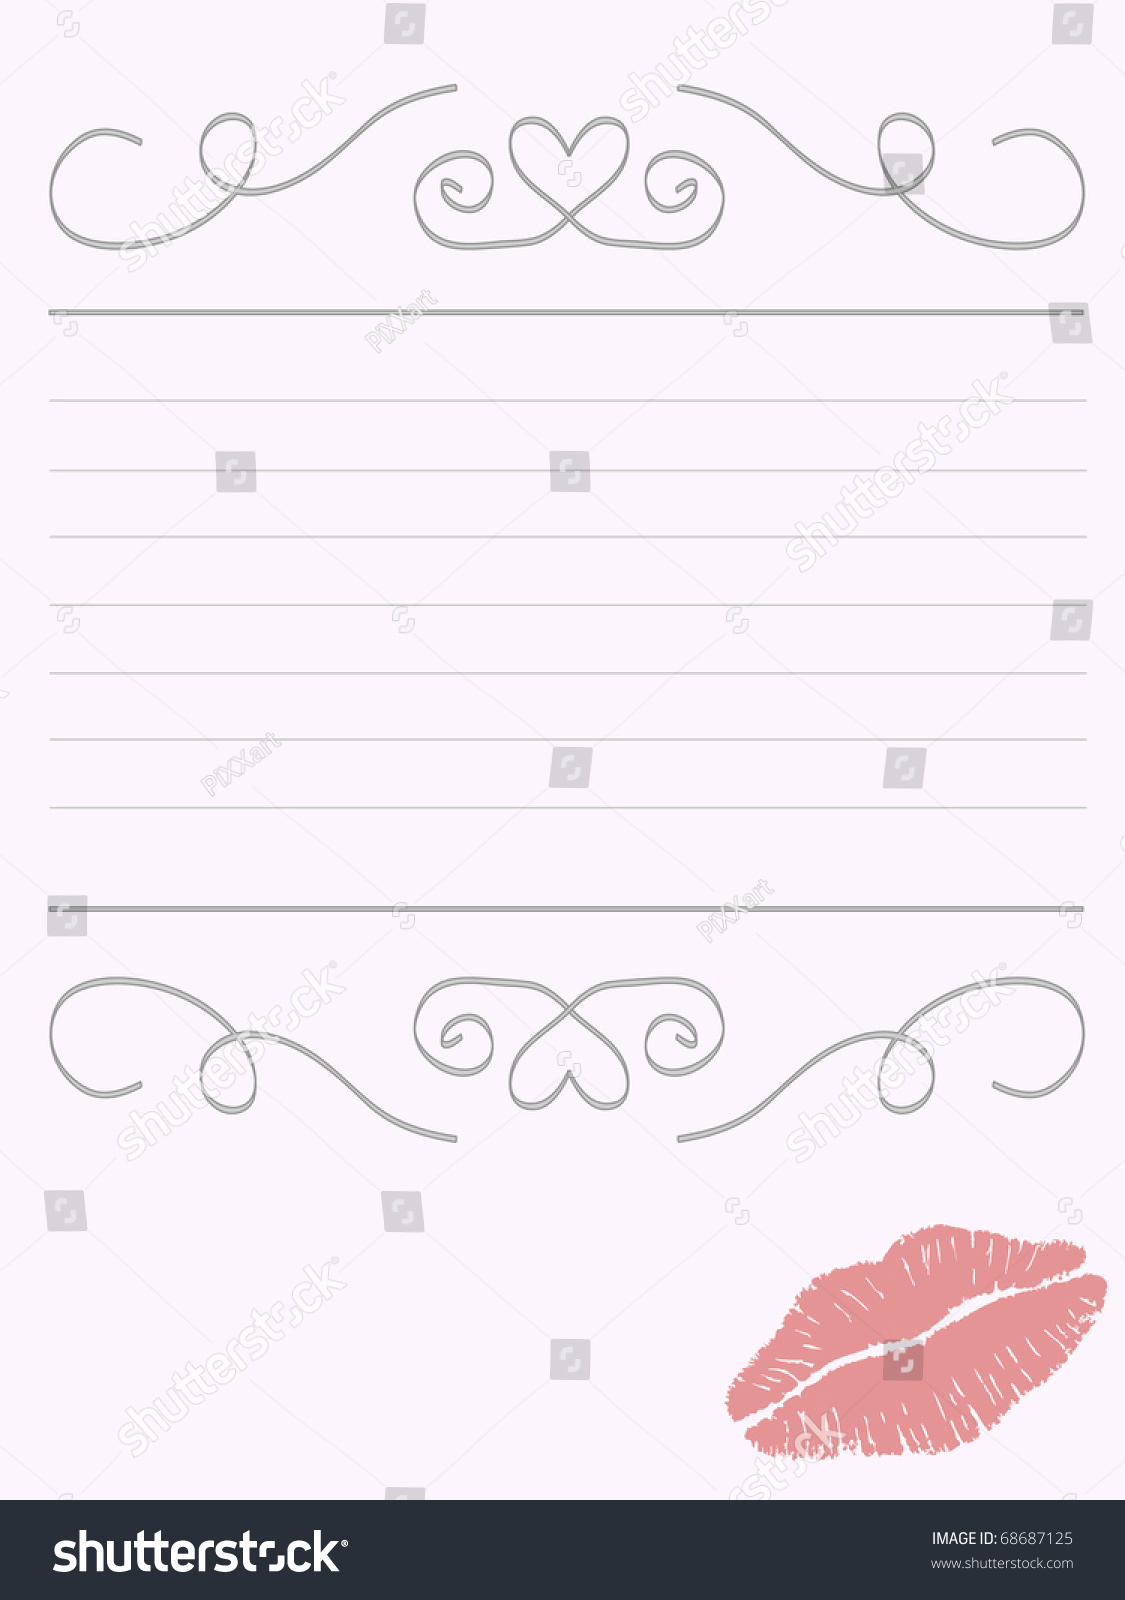 Romantic writing paper